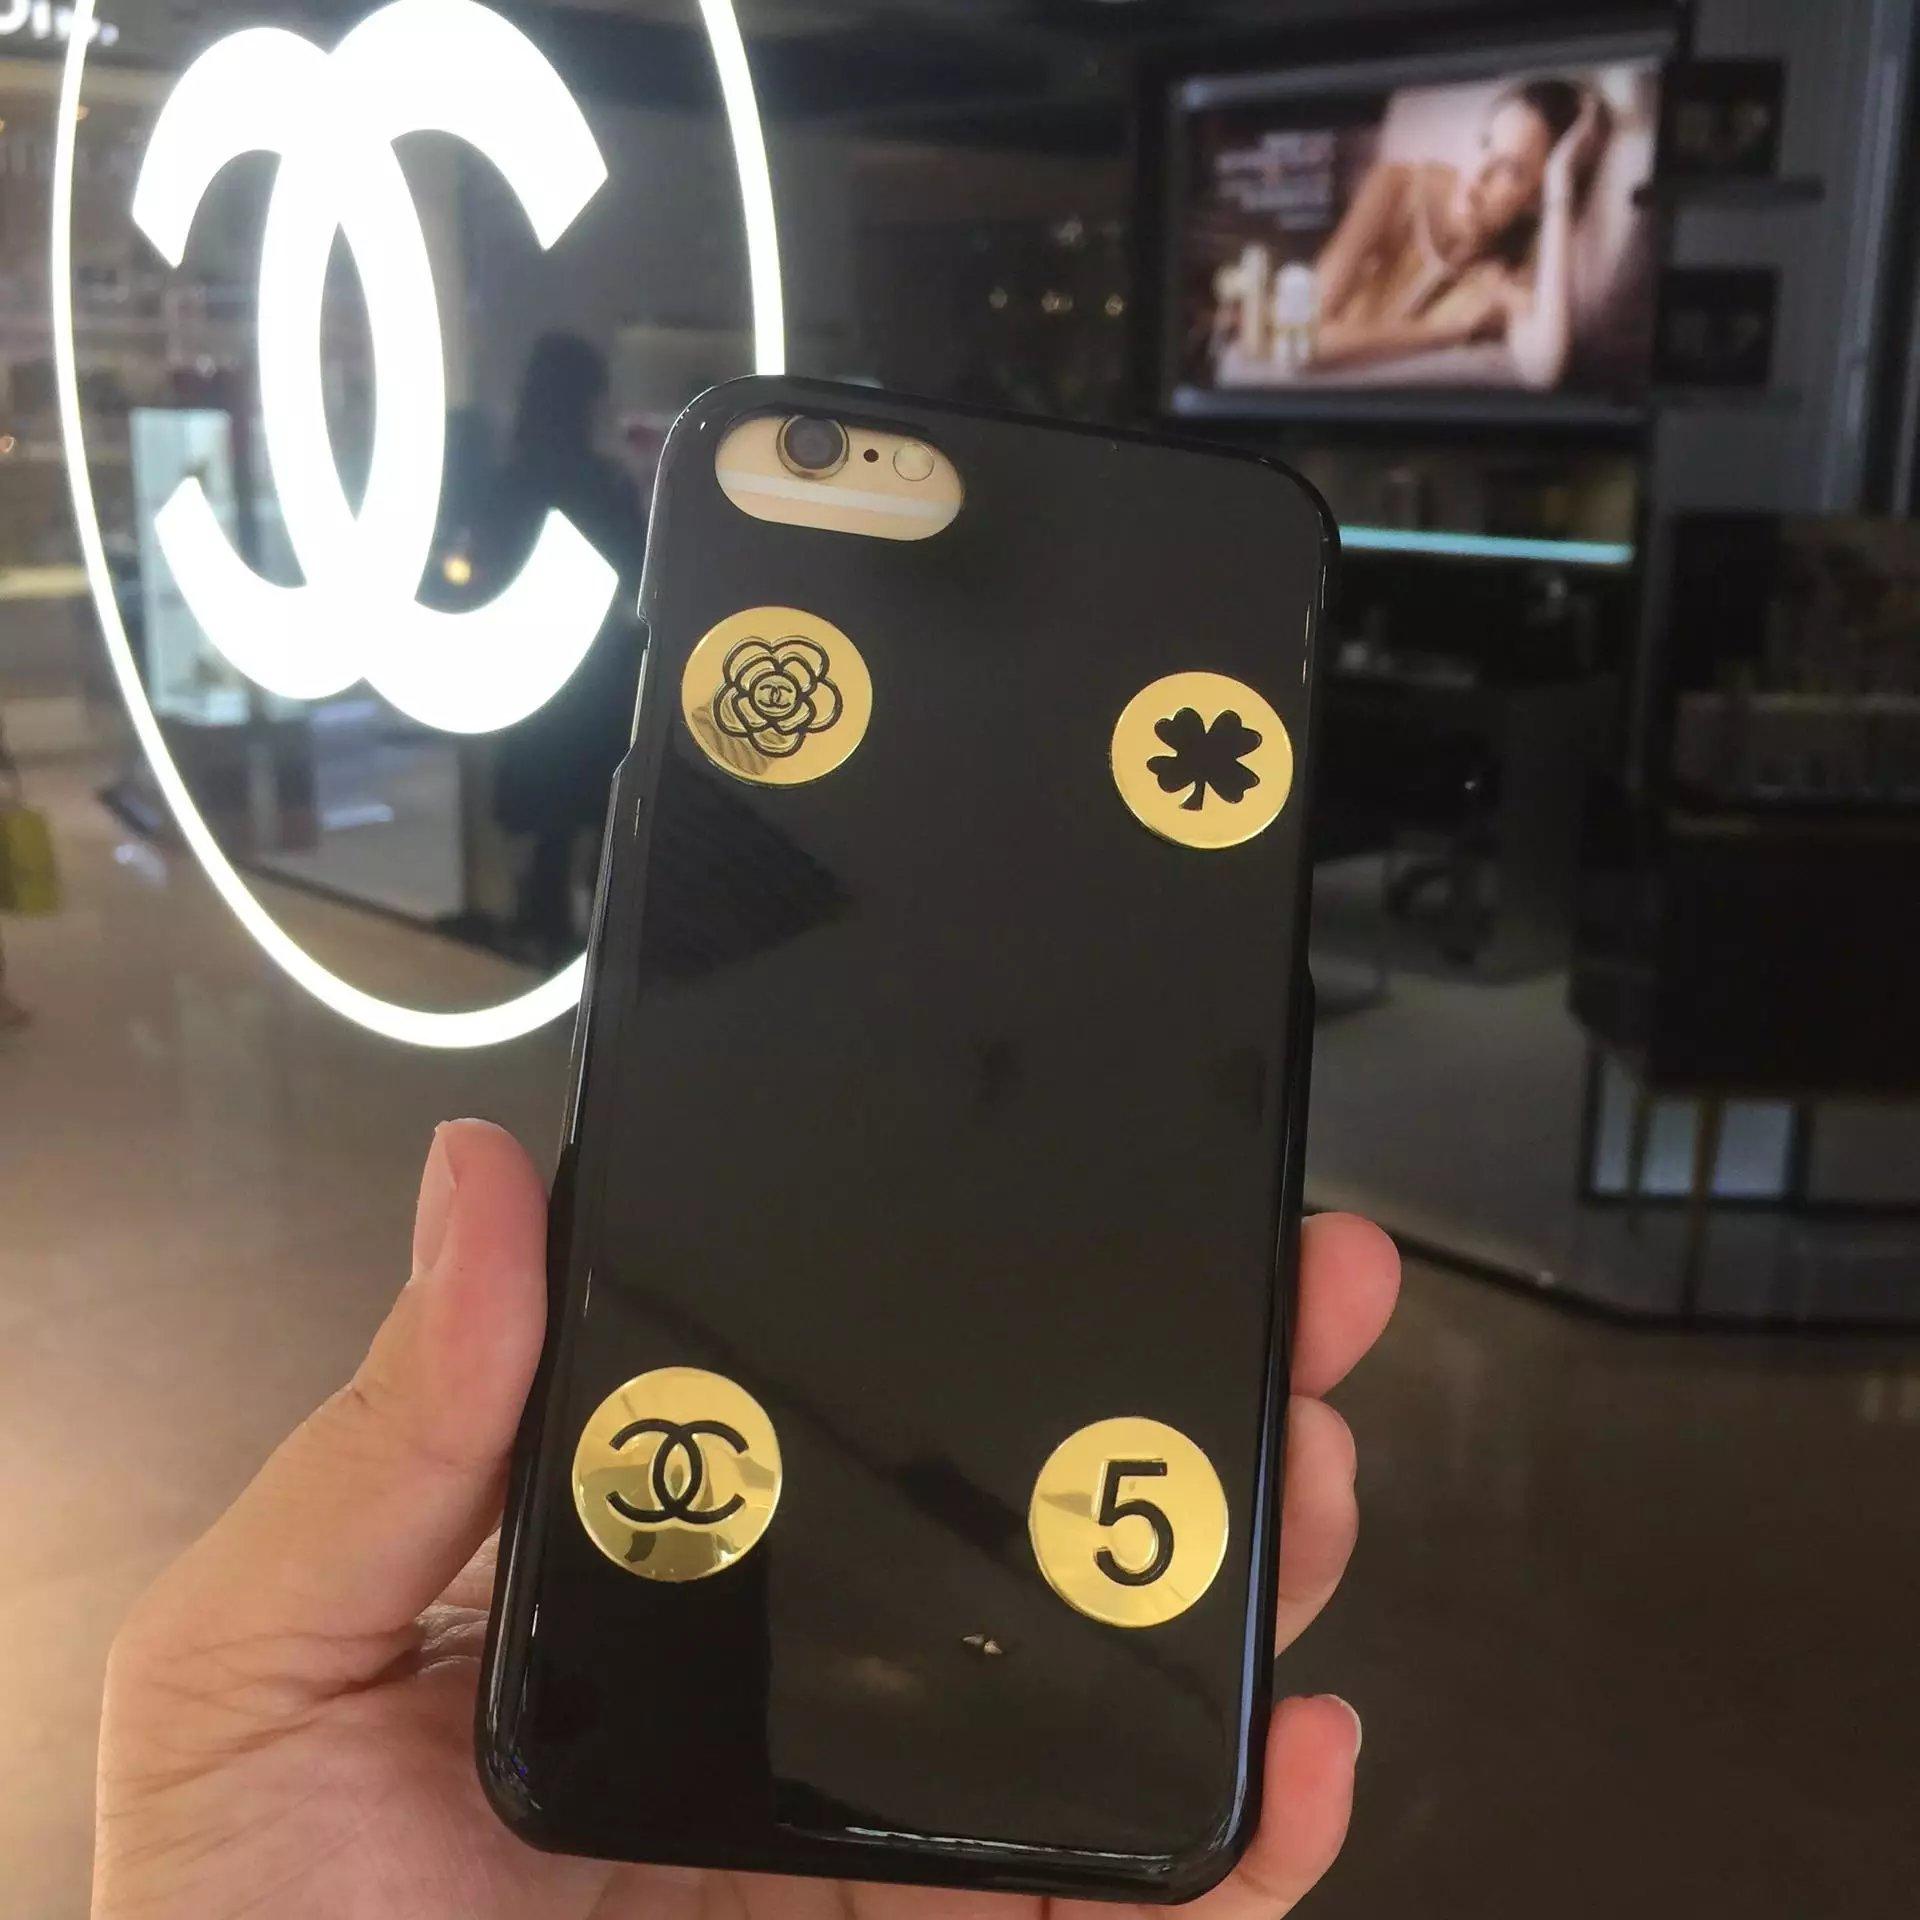 top rated iphone 7 Plus case top ten iphone 7 Plus cases fashion iphone7 Plus case iphone best covers phone 7 Plus cases black iphone 7 Plus case best new iphone cases most popular iphone 7 Plus cases cover case for iphone 7 Plus